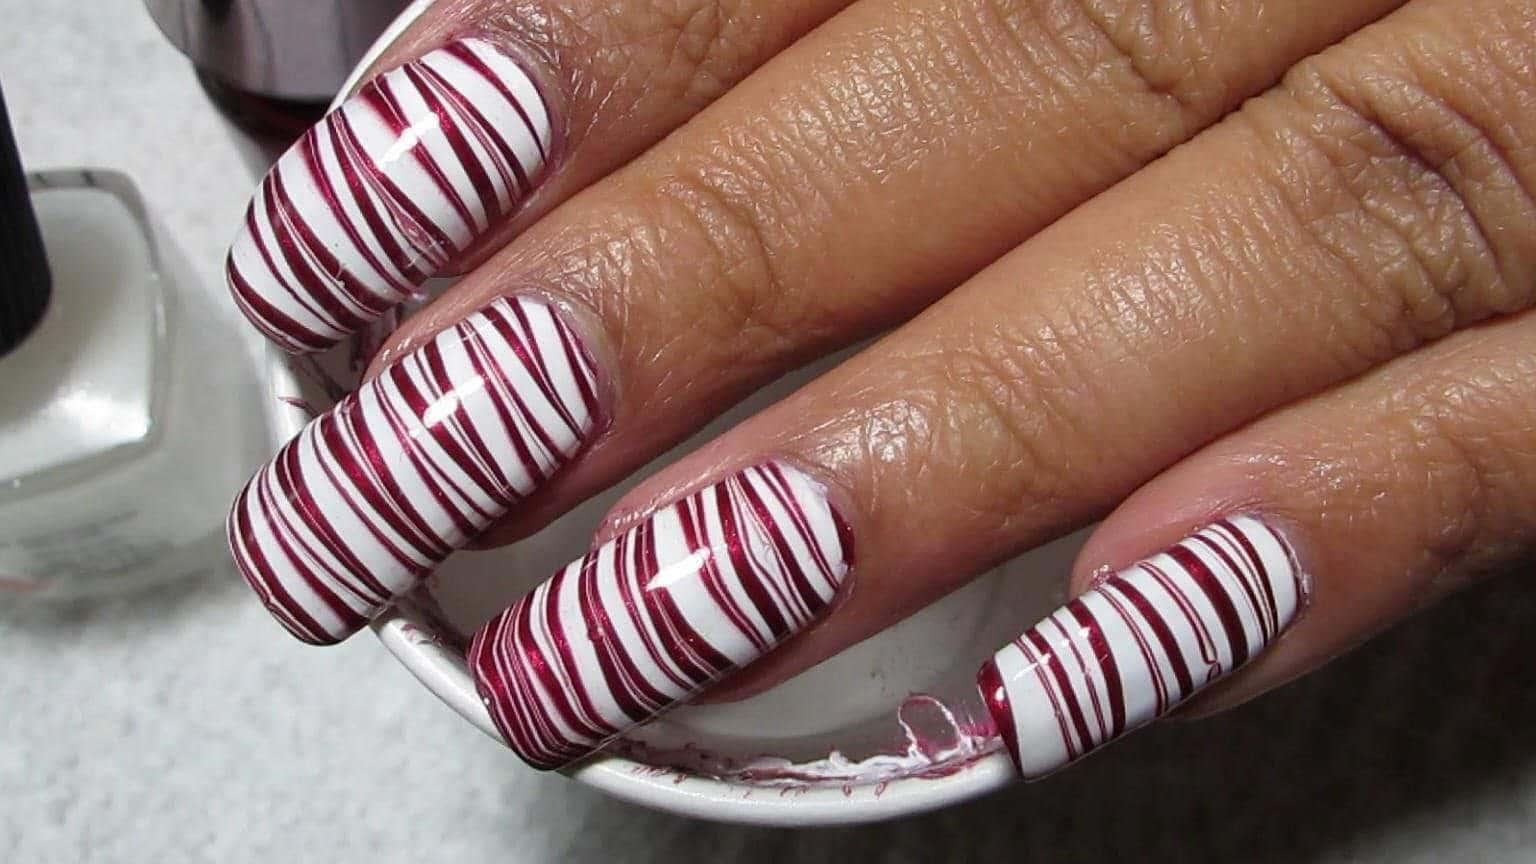 marble nail designs 16